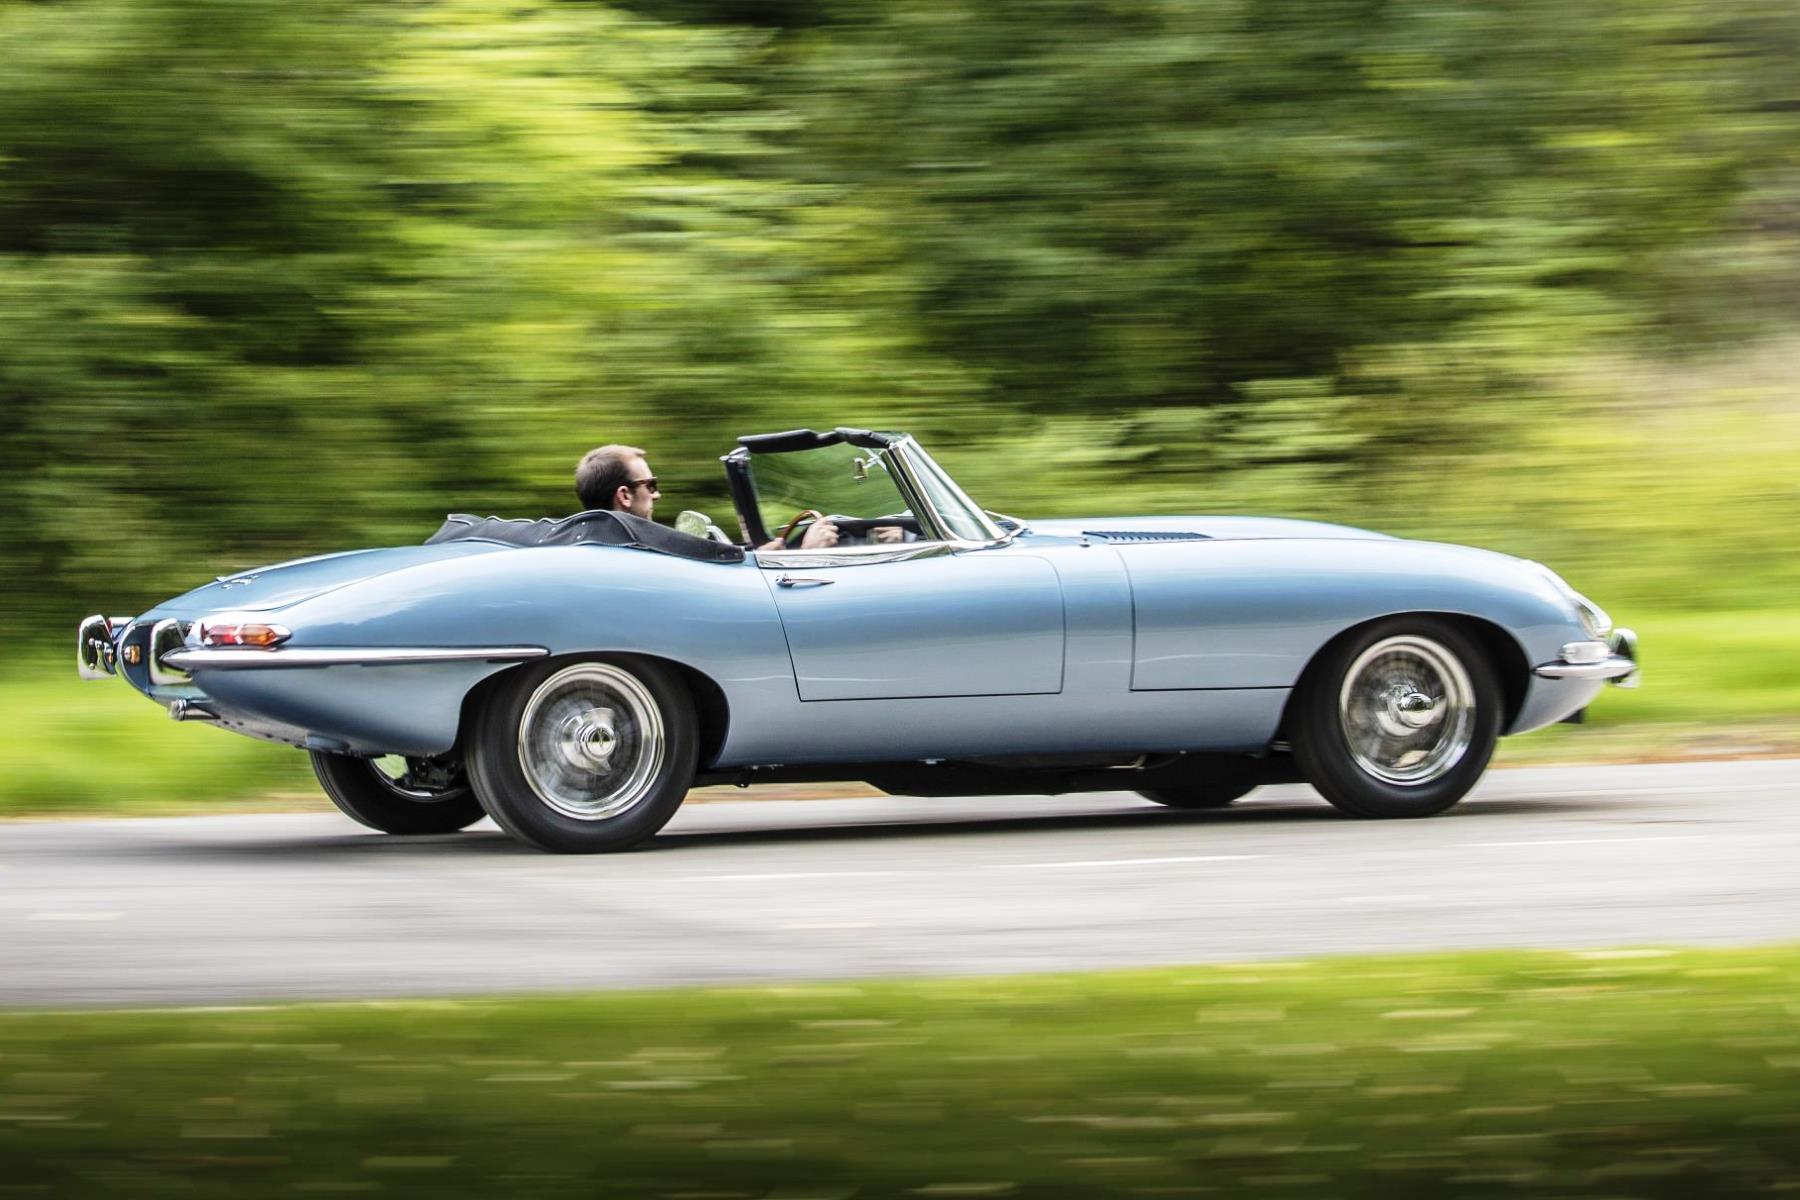 Prince Harry's Jaguar E-Type Zero